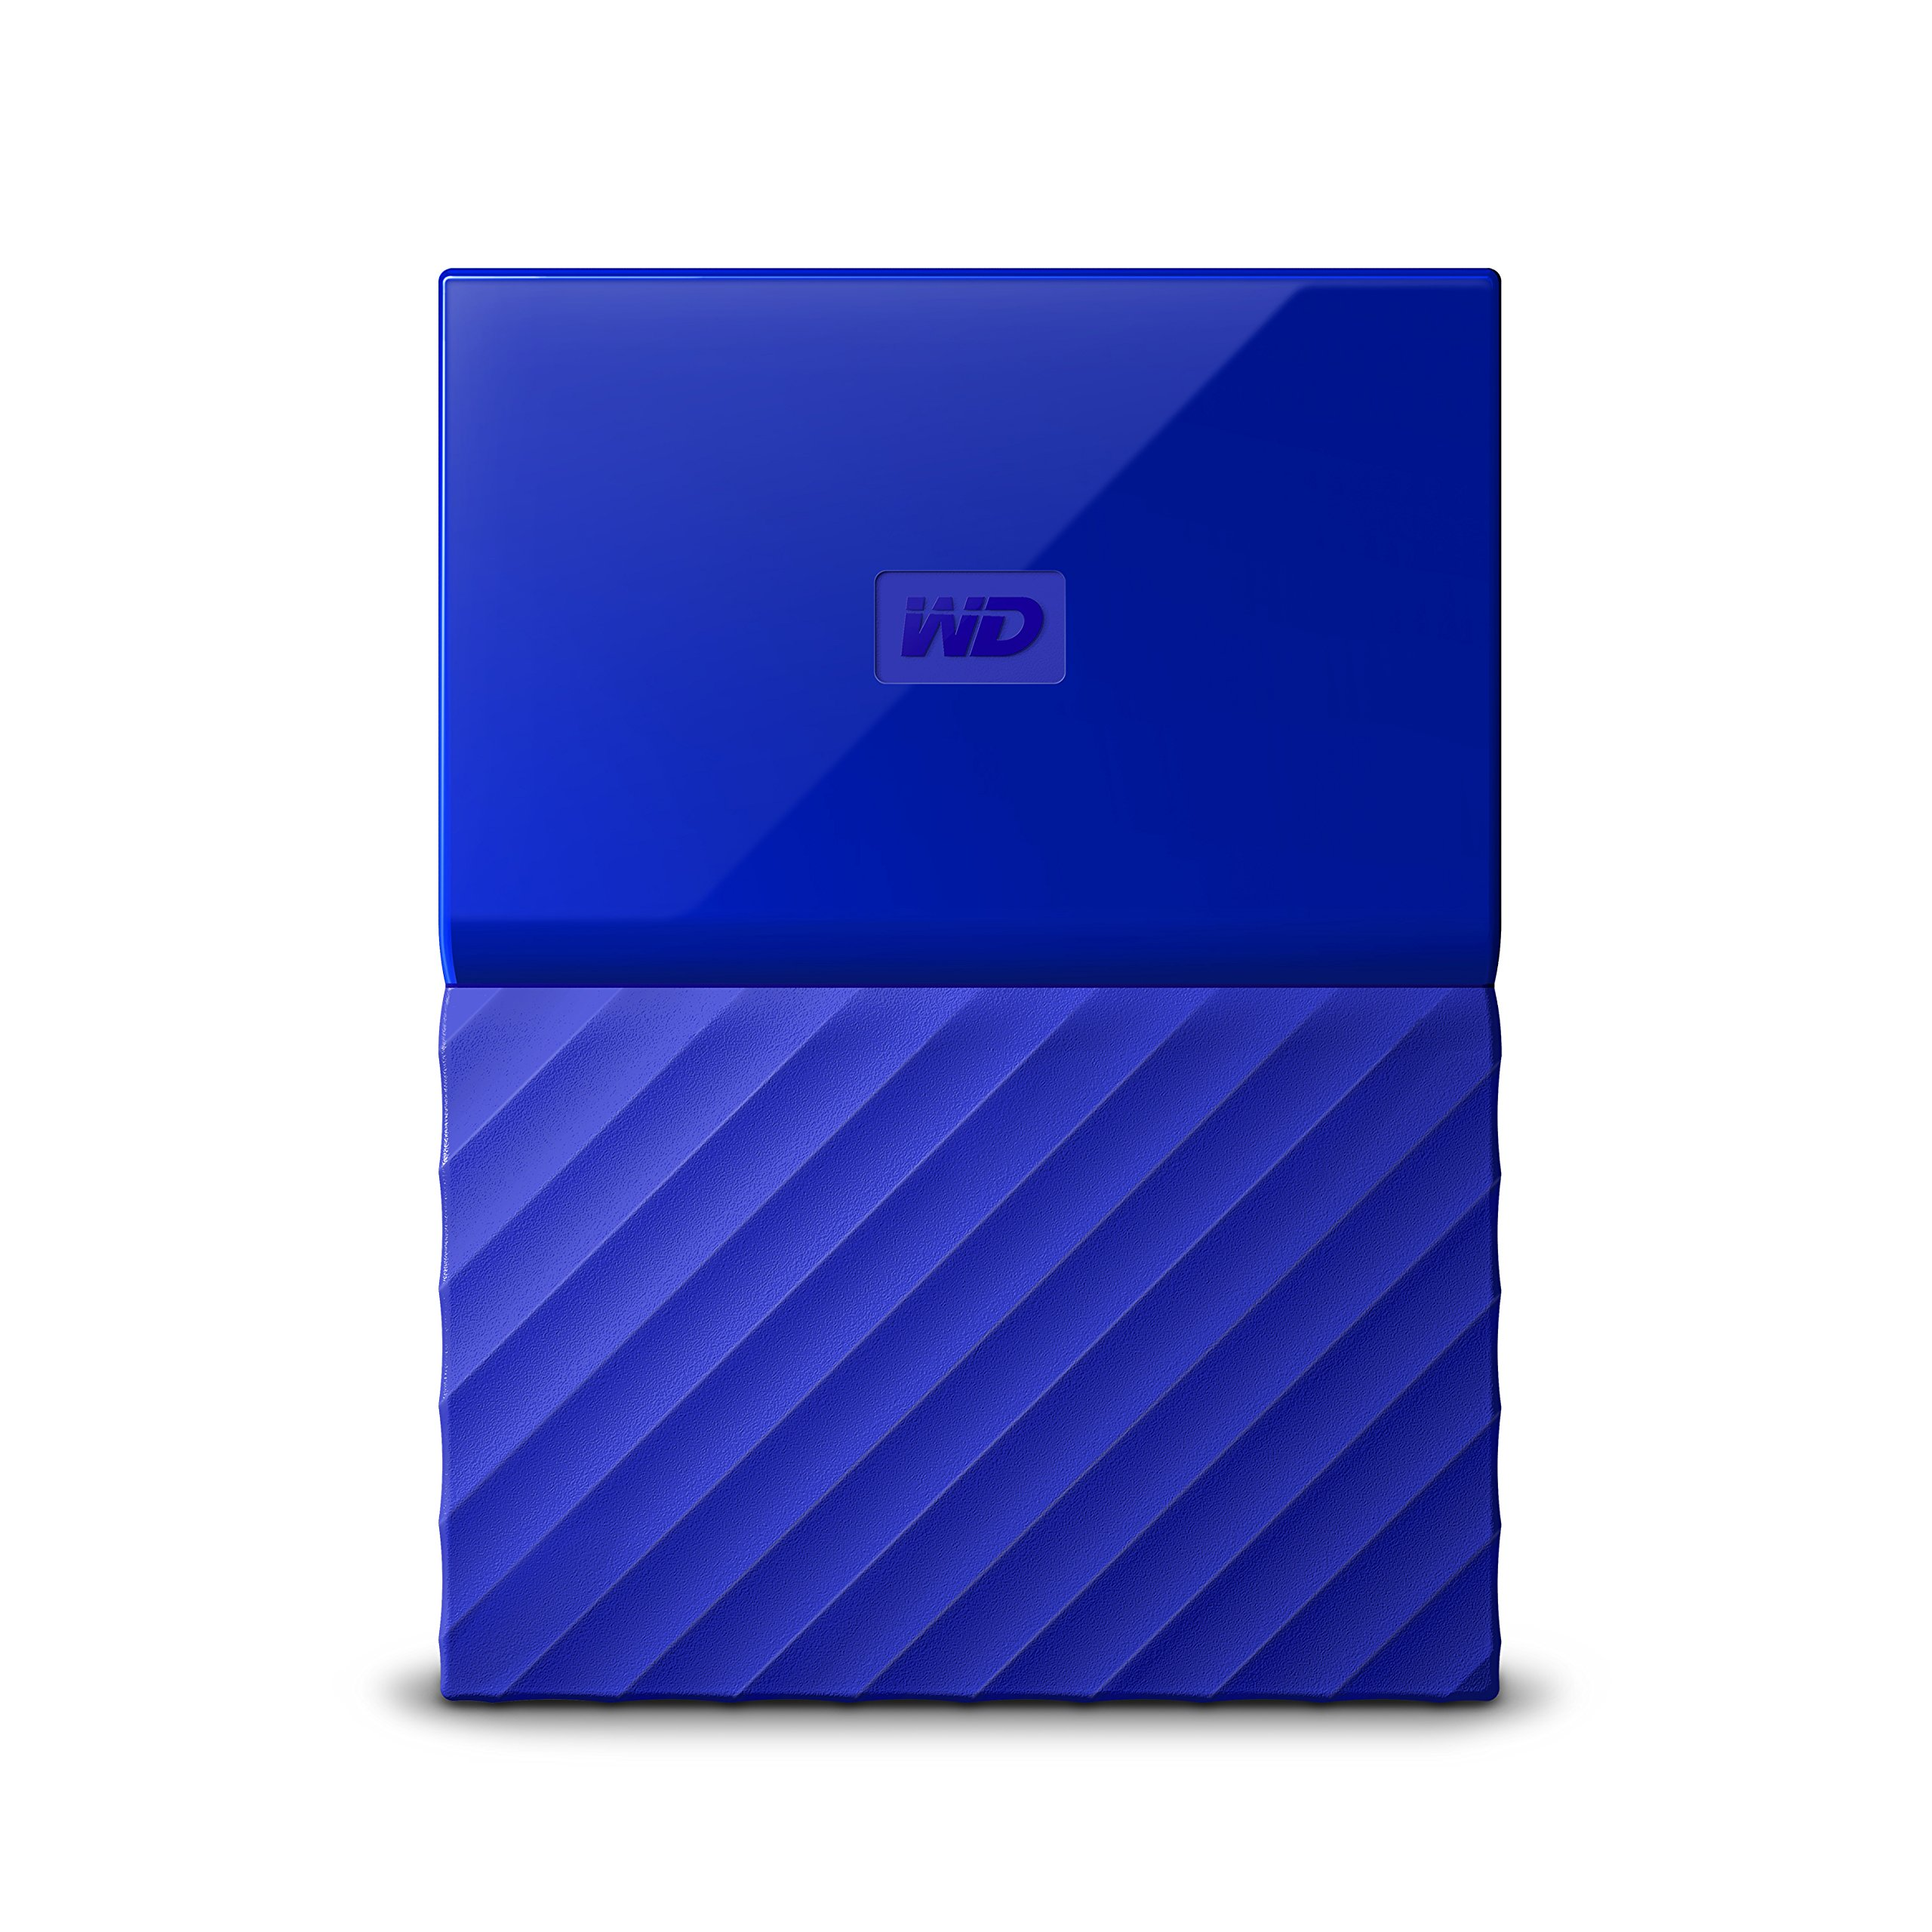 WD 2TB Blue My Passport Portable External Hard Drive - USB 3.0 - WDBYFT0020BBL-WESN